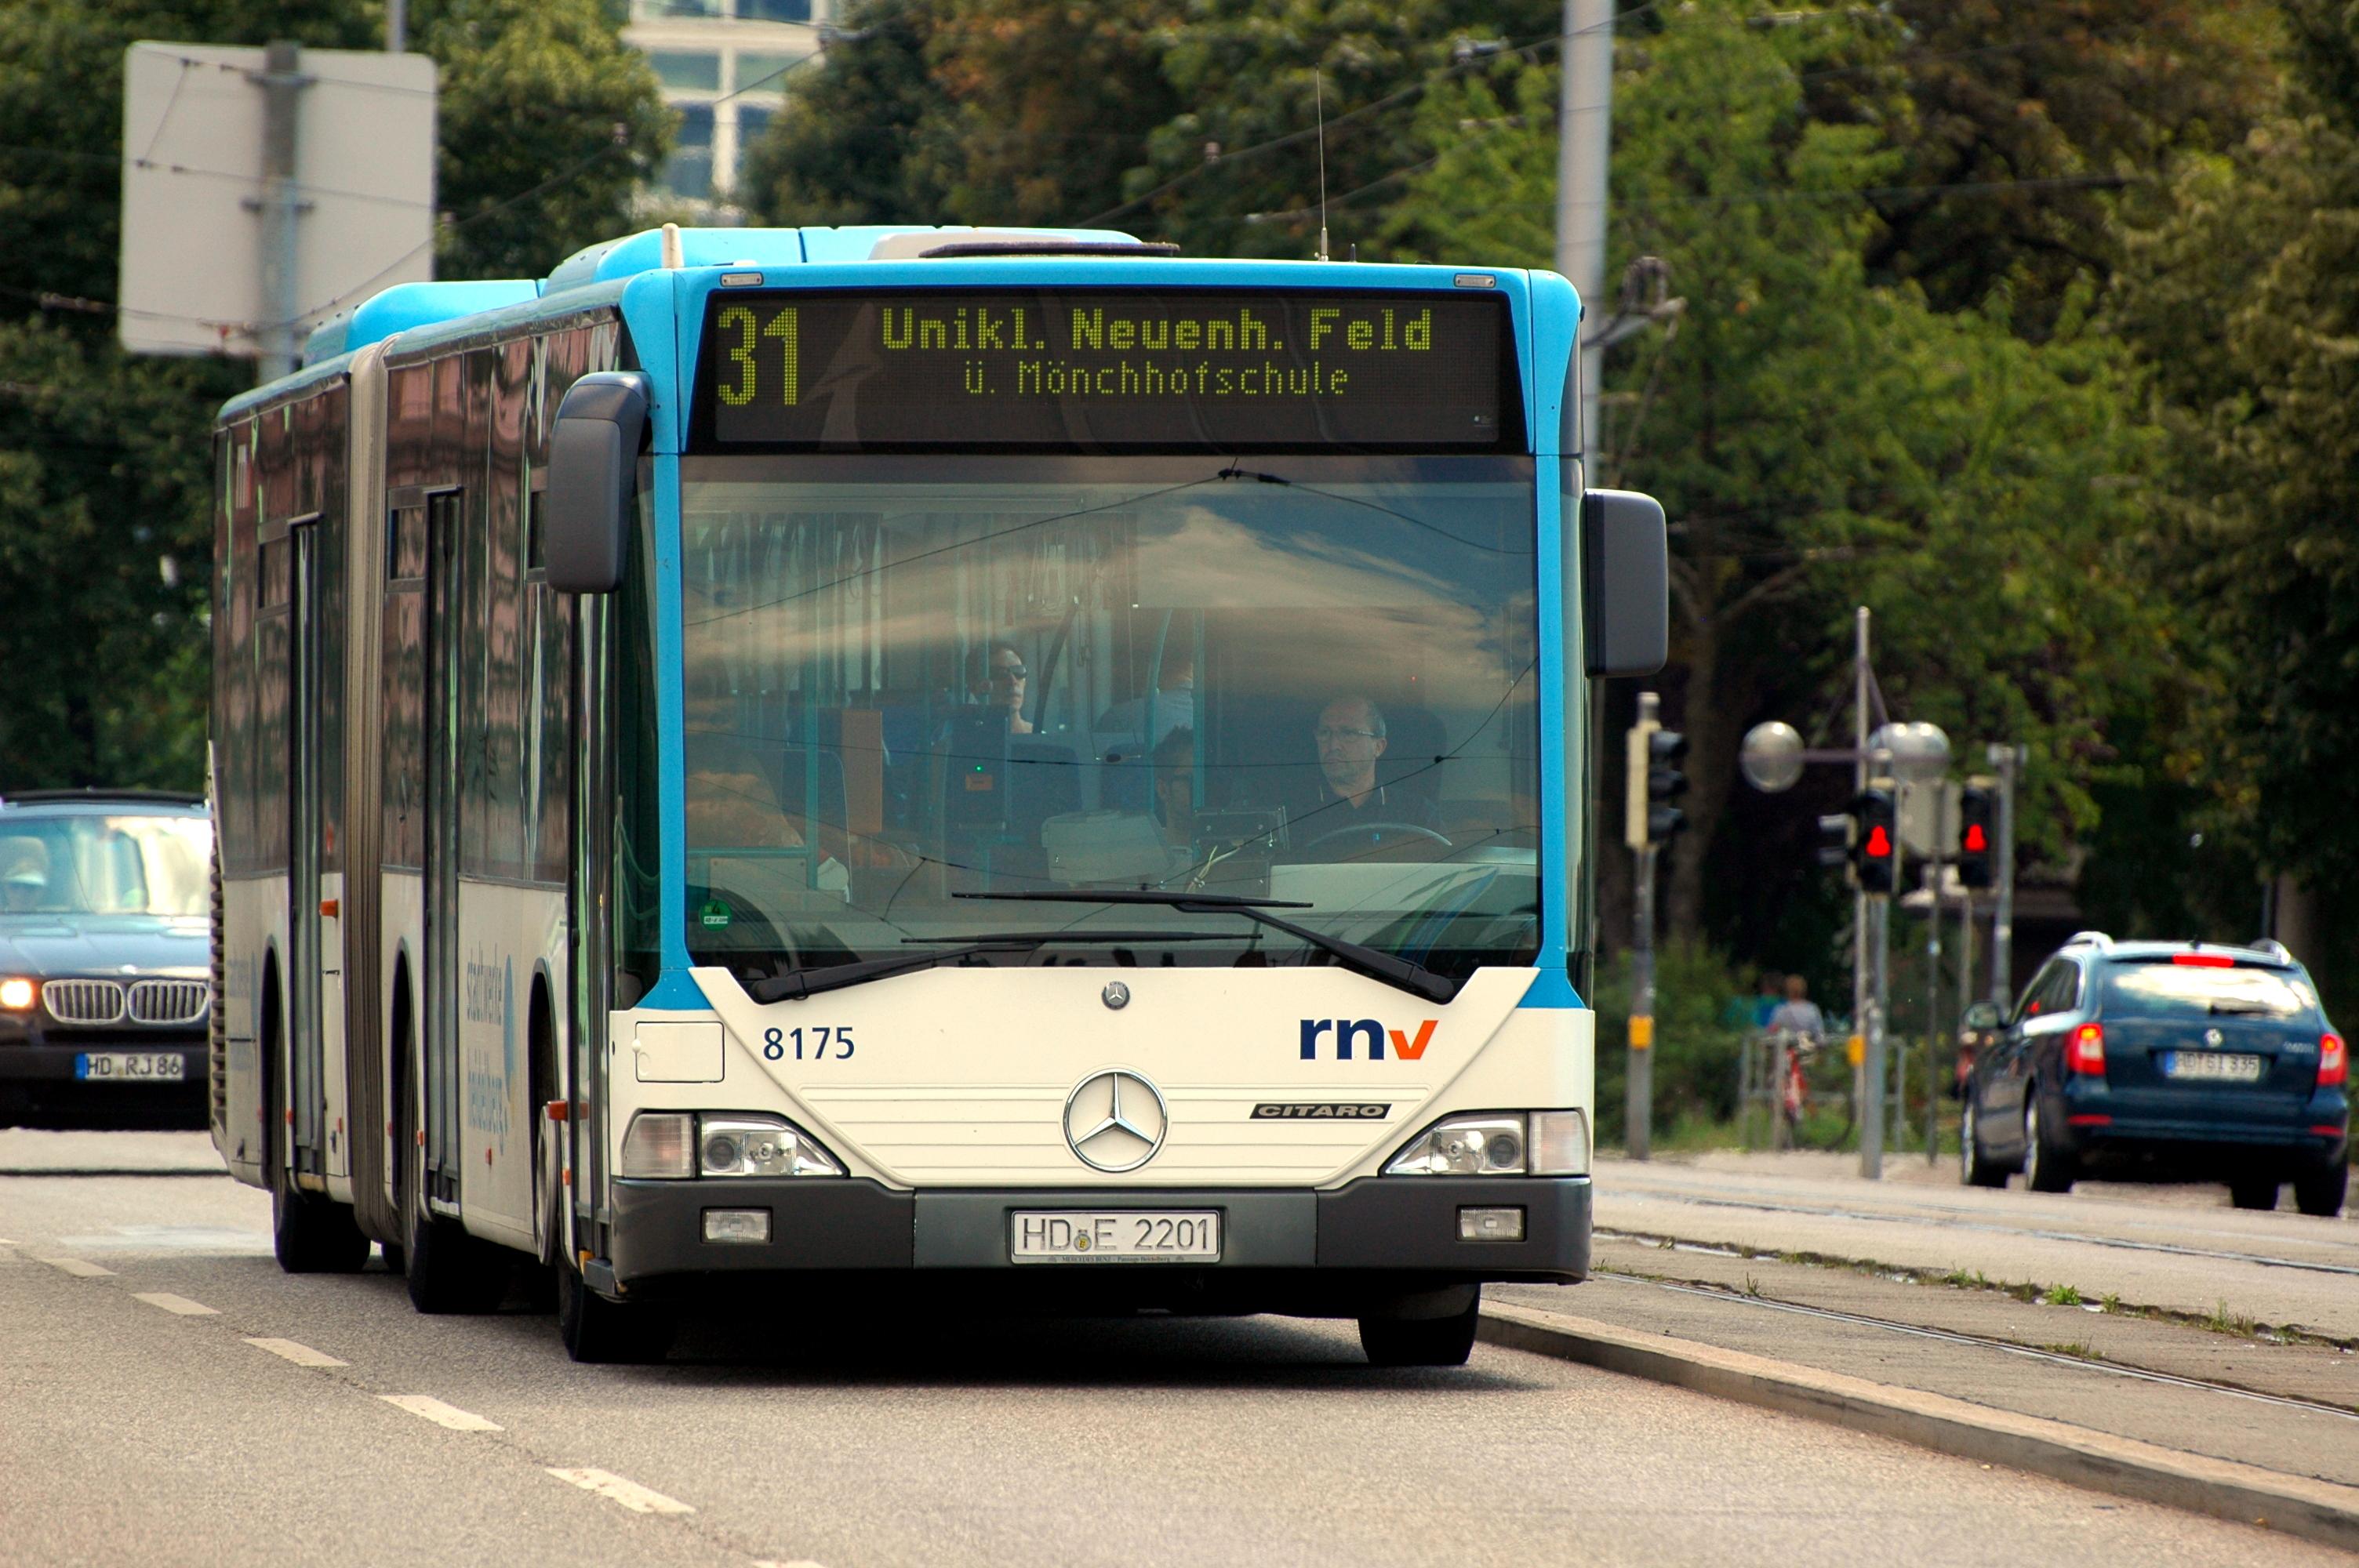 File:Heidelberg - Mercedes-Benz Citaro O 530 I RNV8175 HD E 2201.